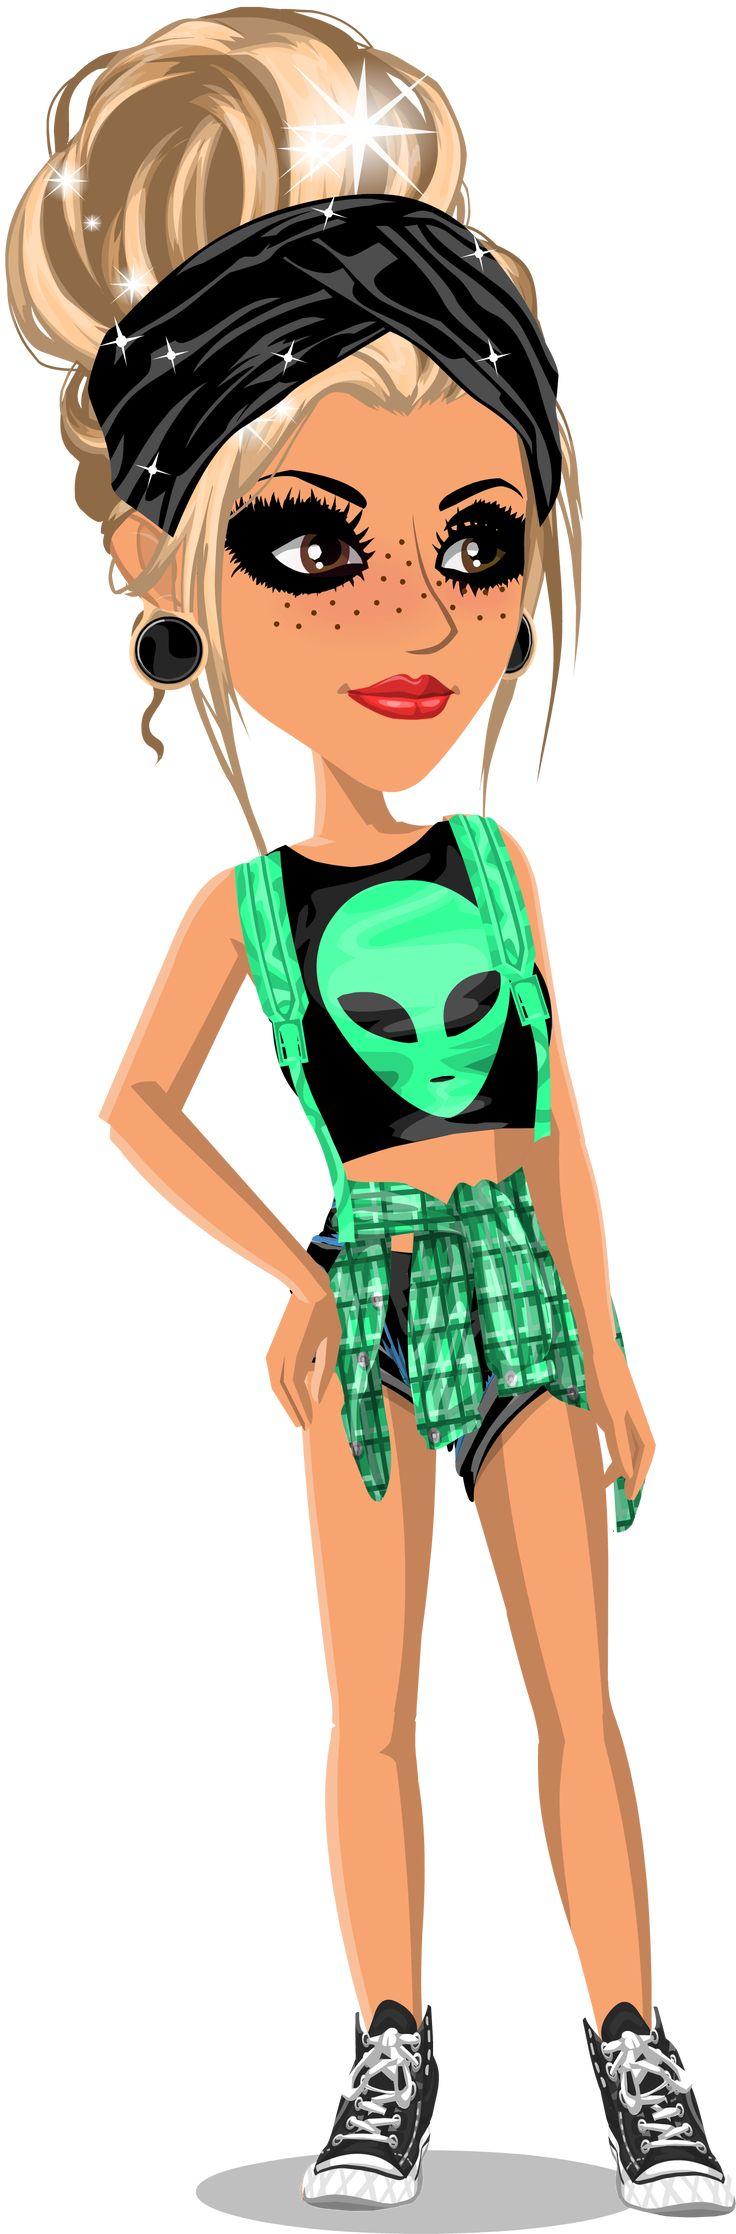 My MSP Girl!! Cute Msp look for VIPs! Kalie Brooks= Msp Account